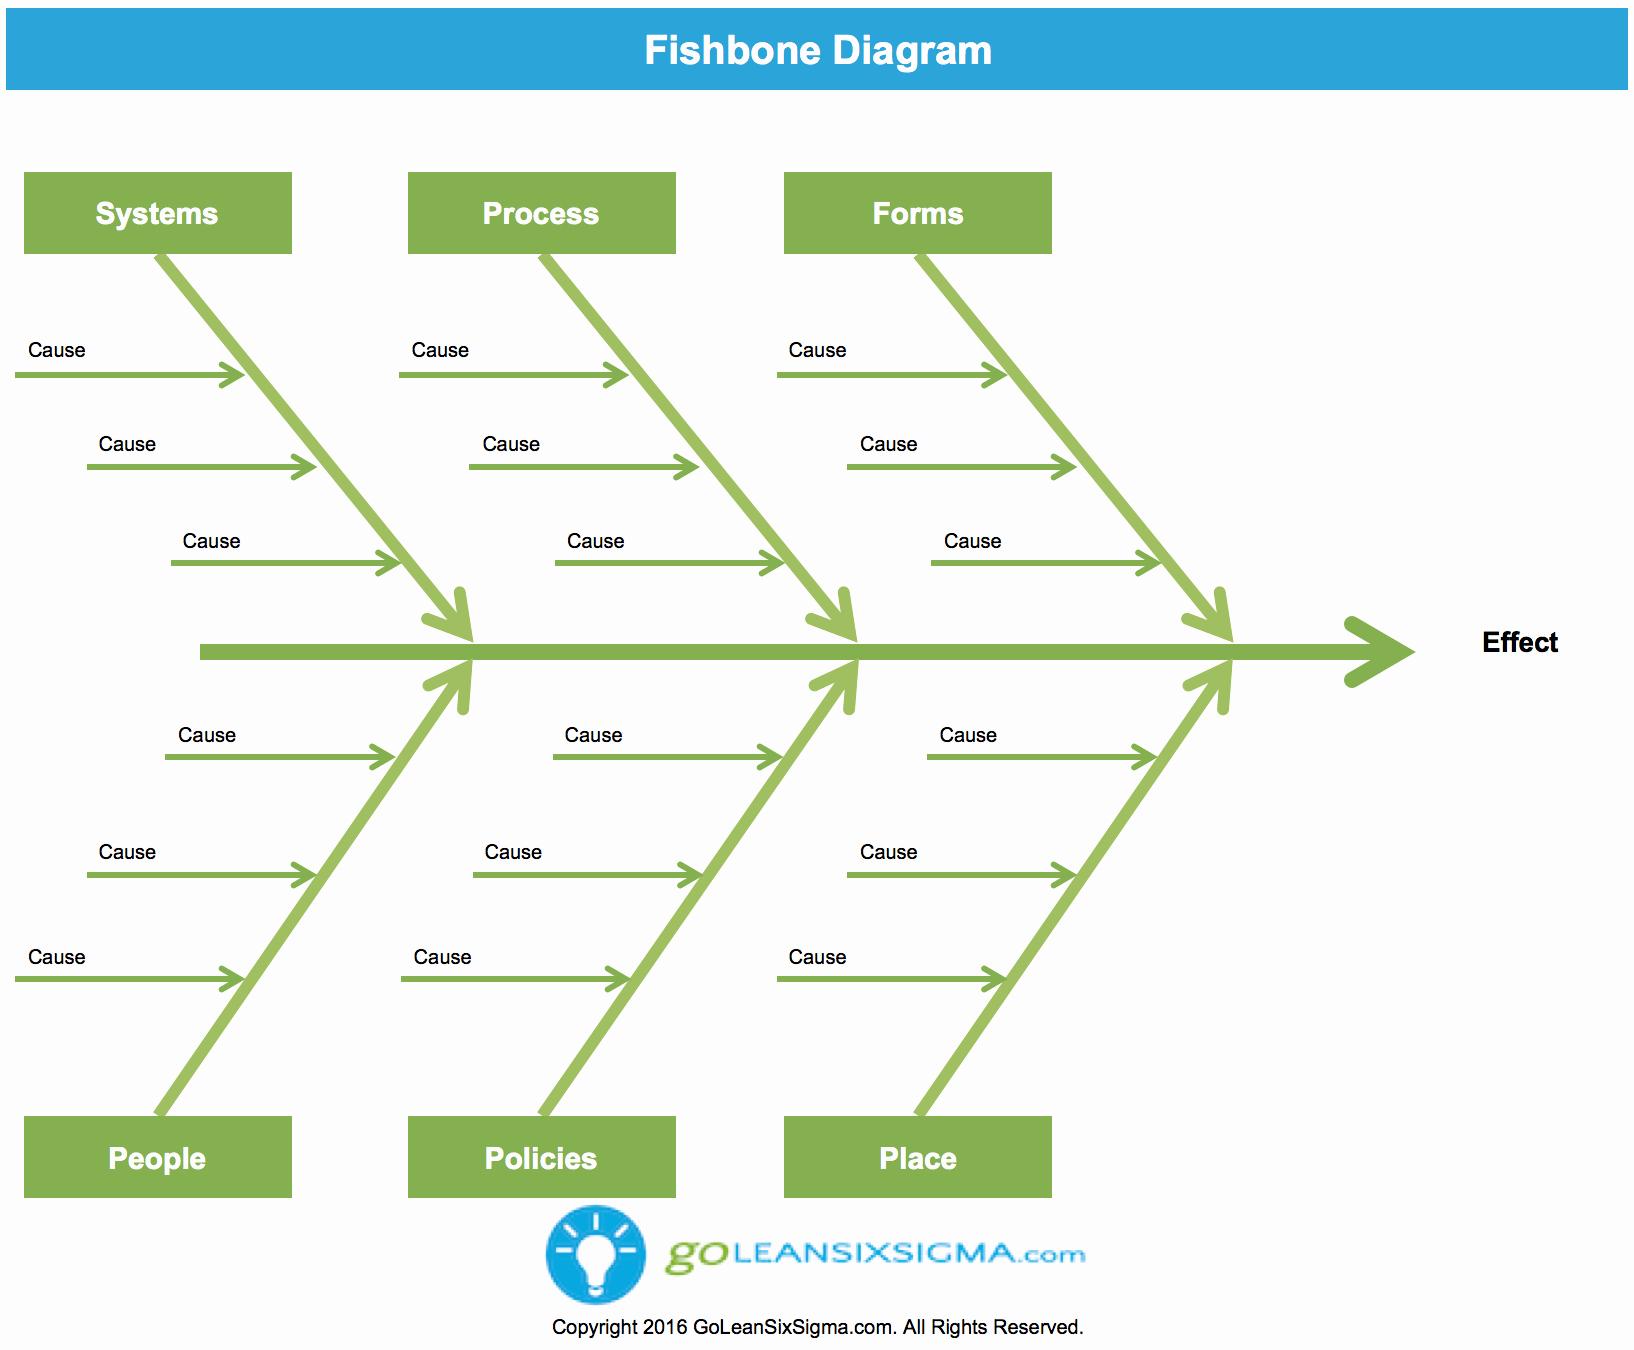 Fishbone Diagram Template Xls Awesome Fishbone Diagram Aka Cause & Effect Diagram Template